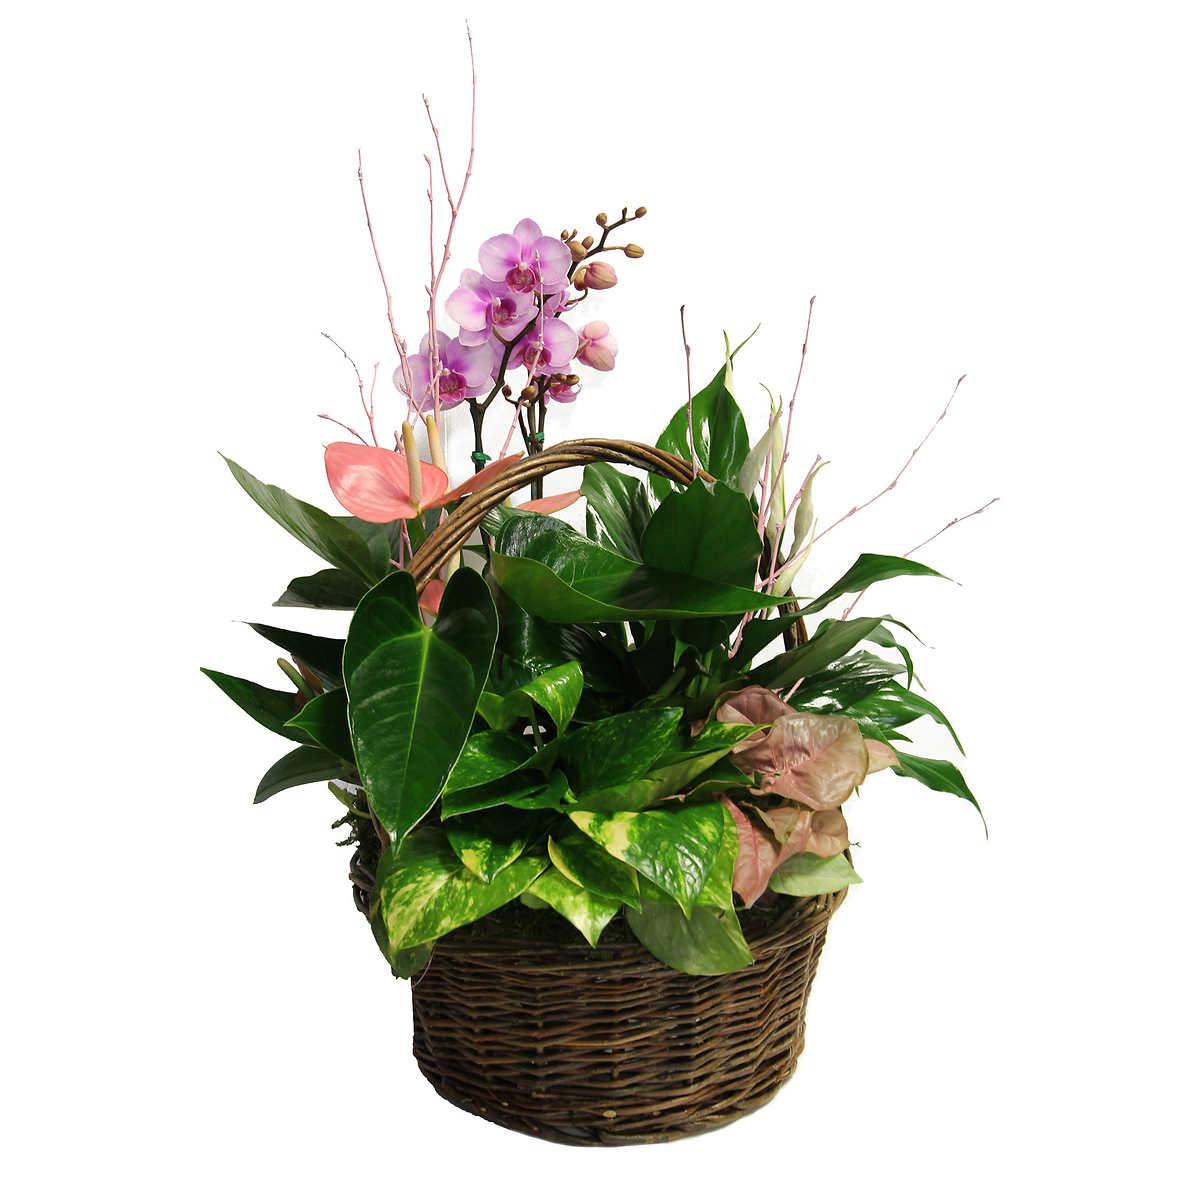 Lovely Purplepink Orchids Phalaenopsis Anthurium Flower Floral